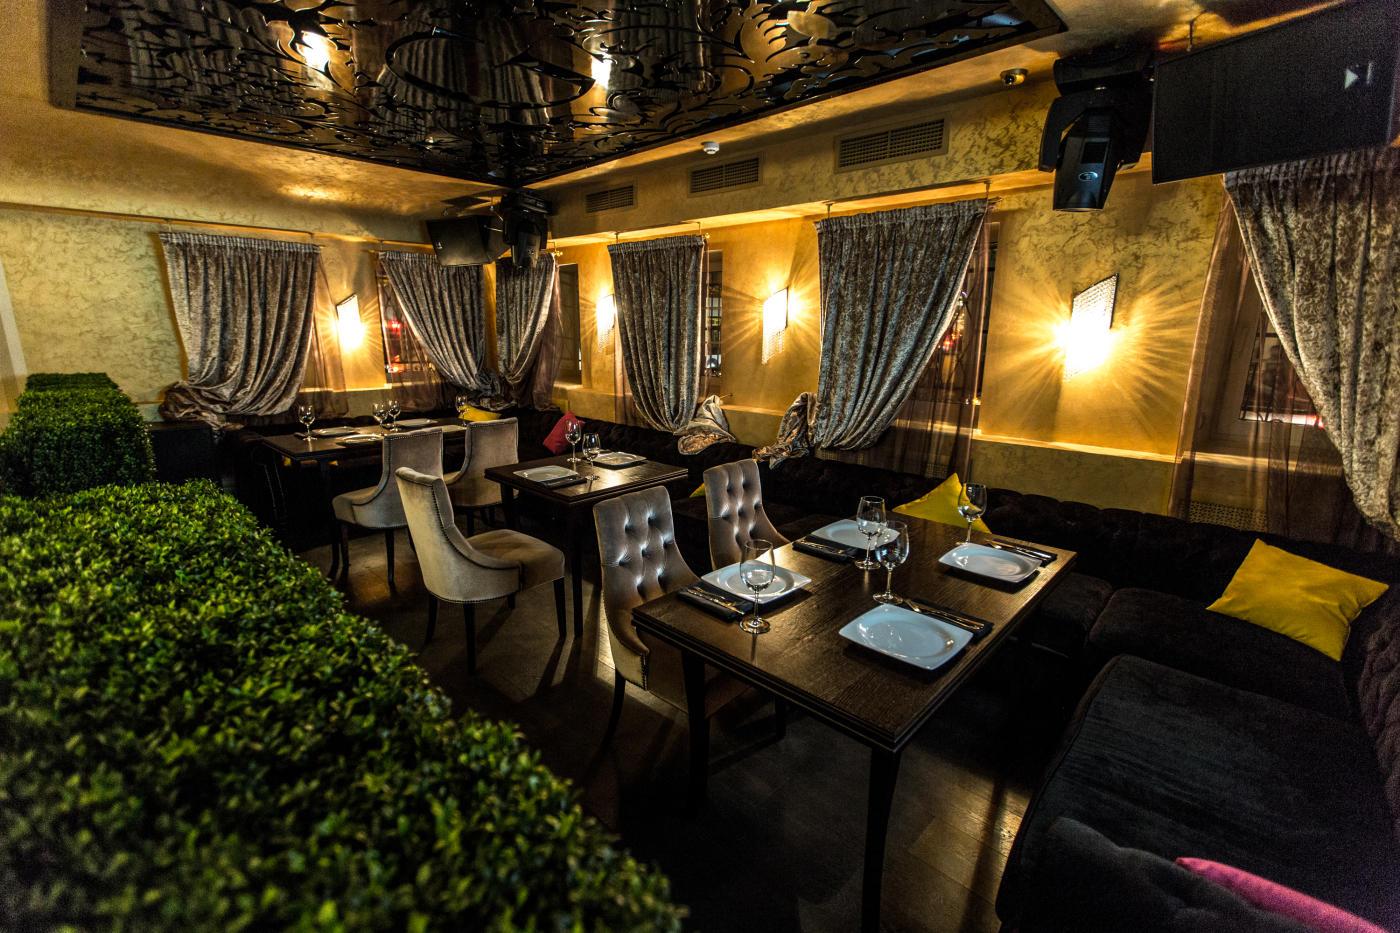 Ресторан Graff Lounge (Граф Лаунж) фото 2